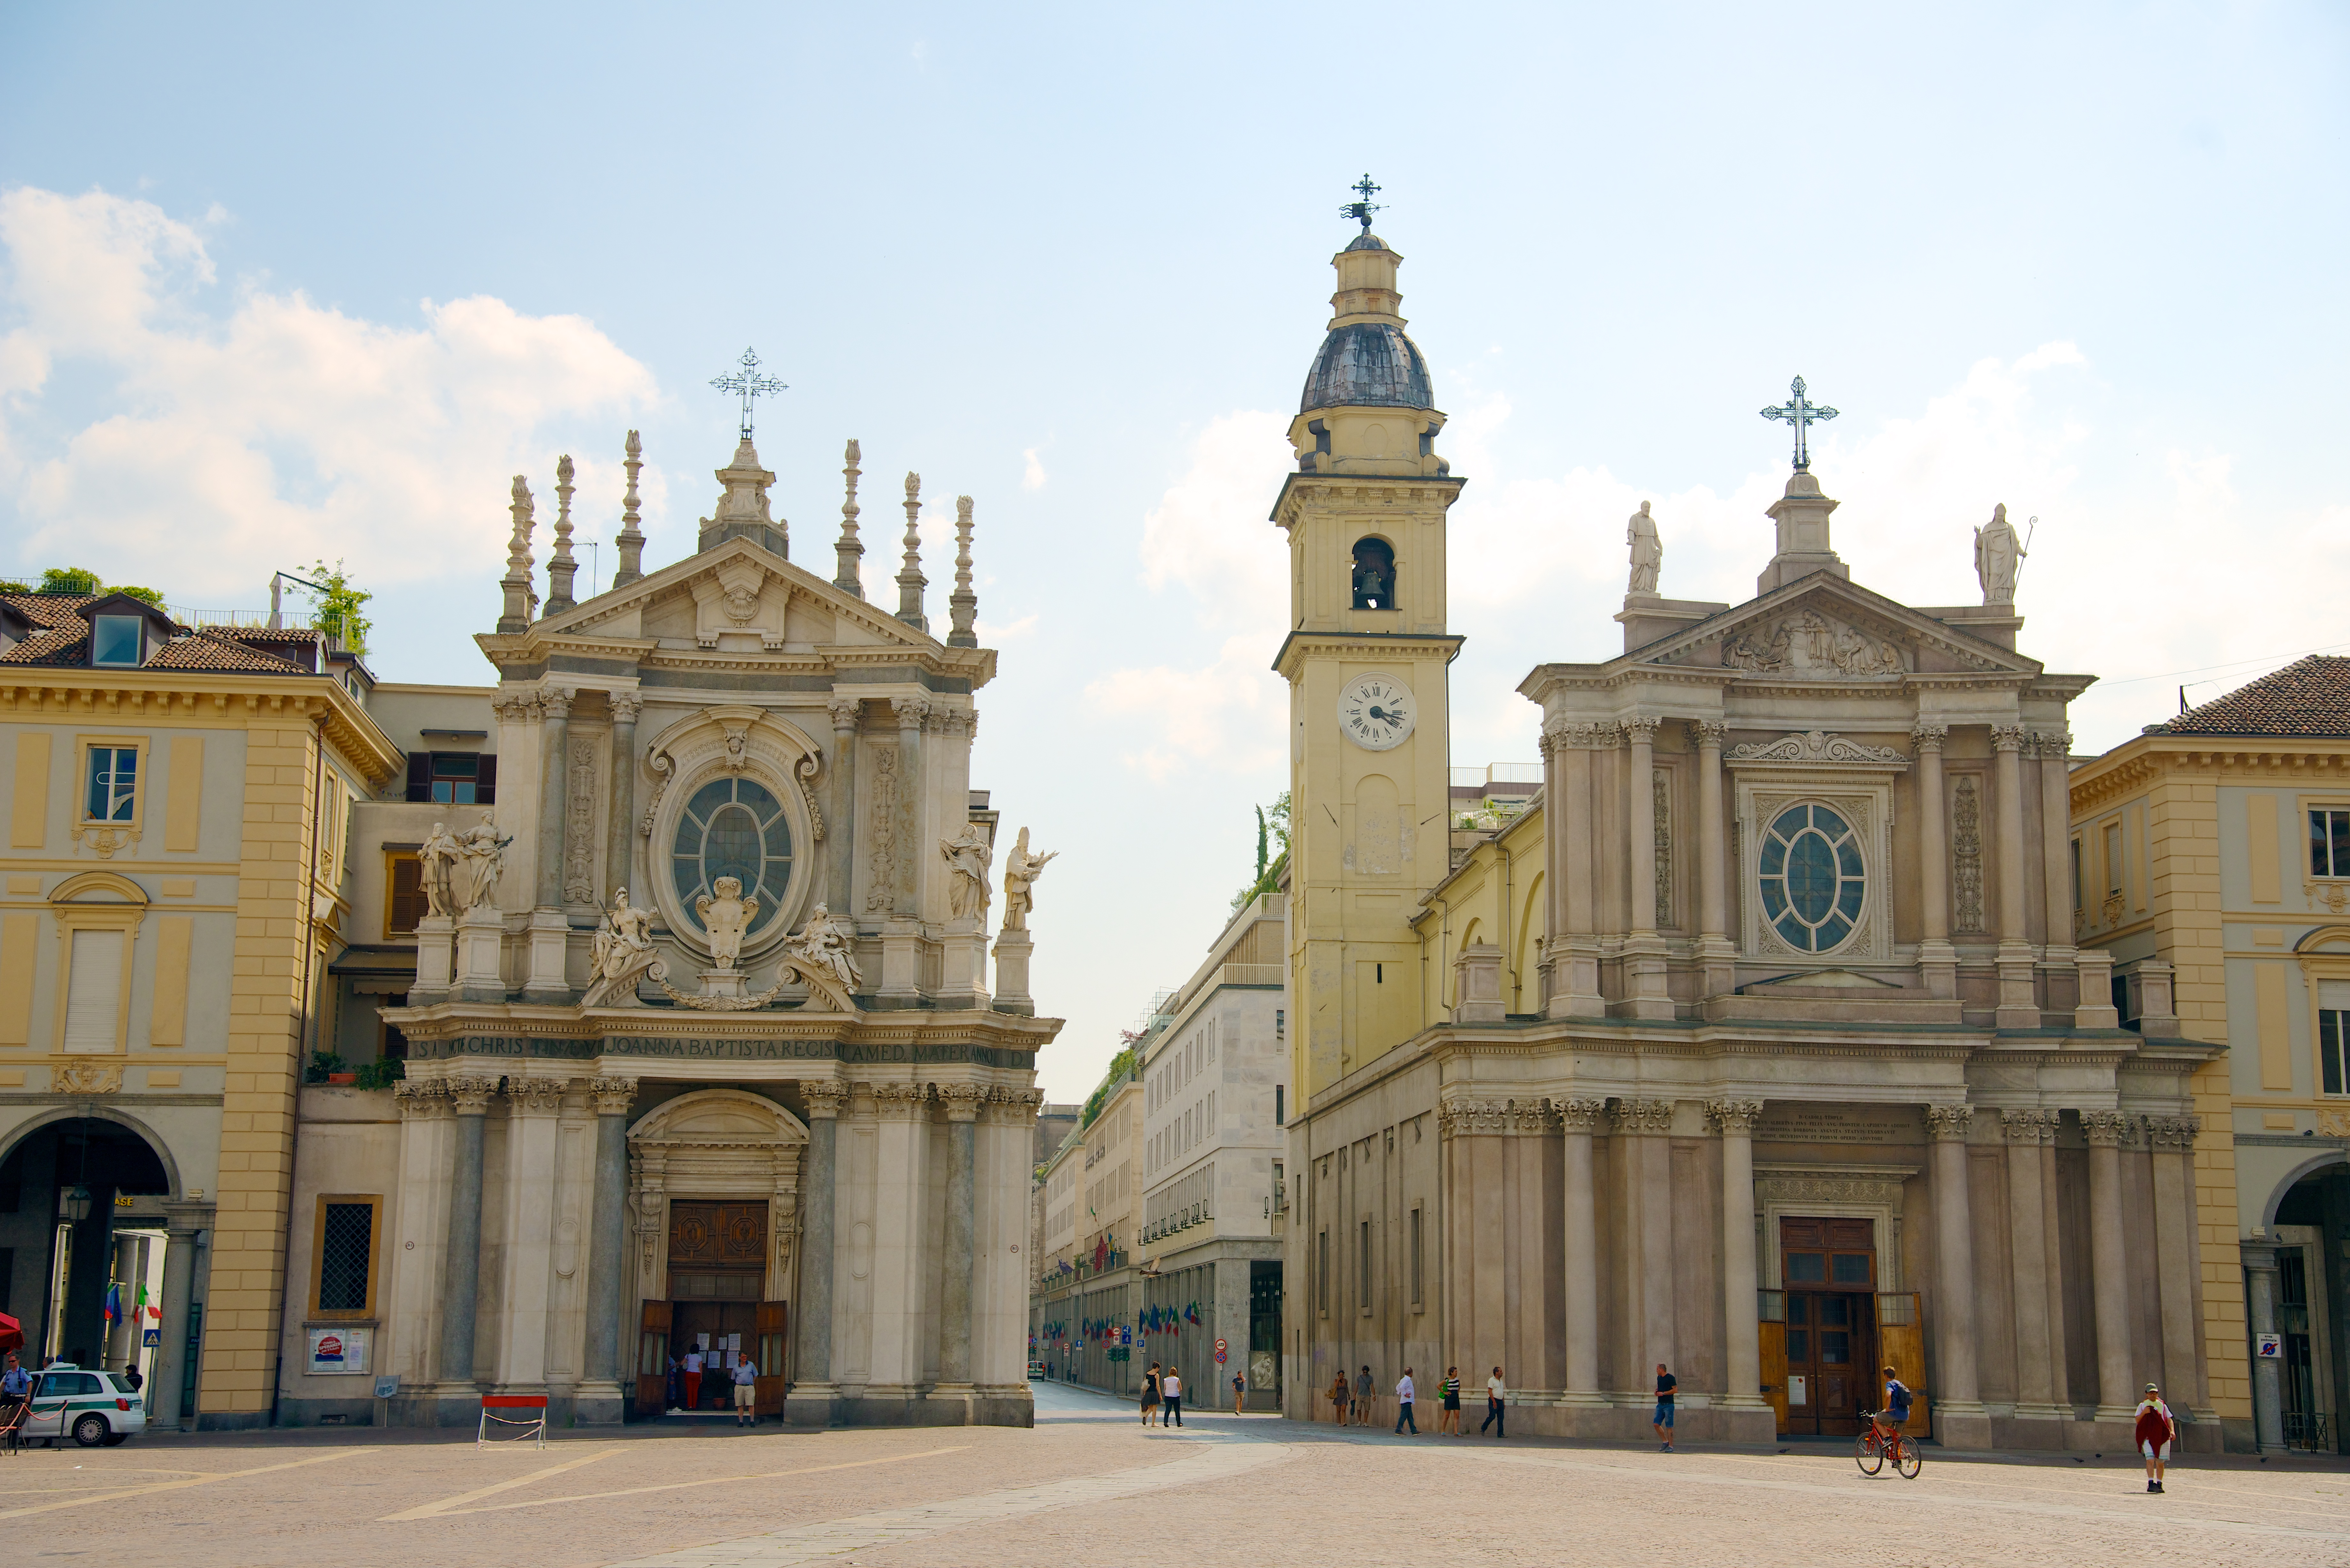 Imagebox_-_Torino_Piazza_San_Carlo_-9.jpg?1548991531